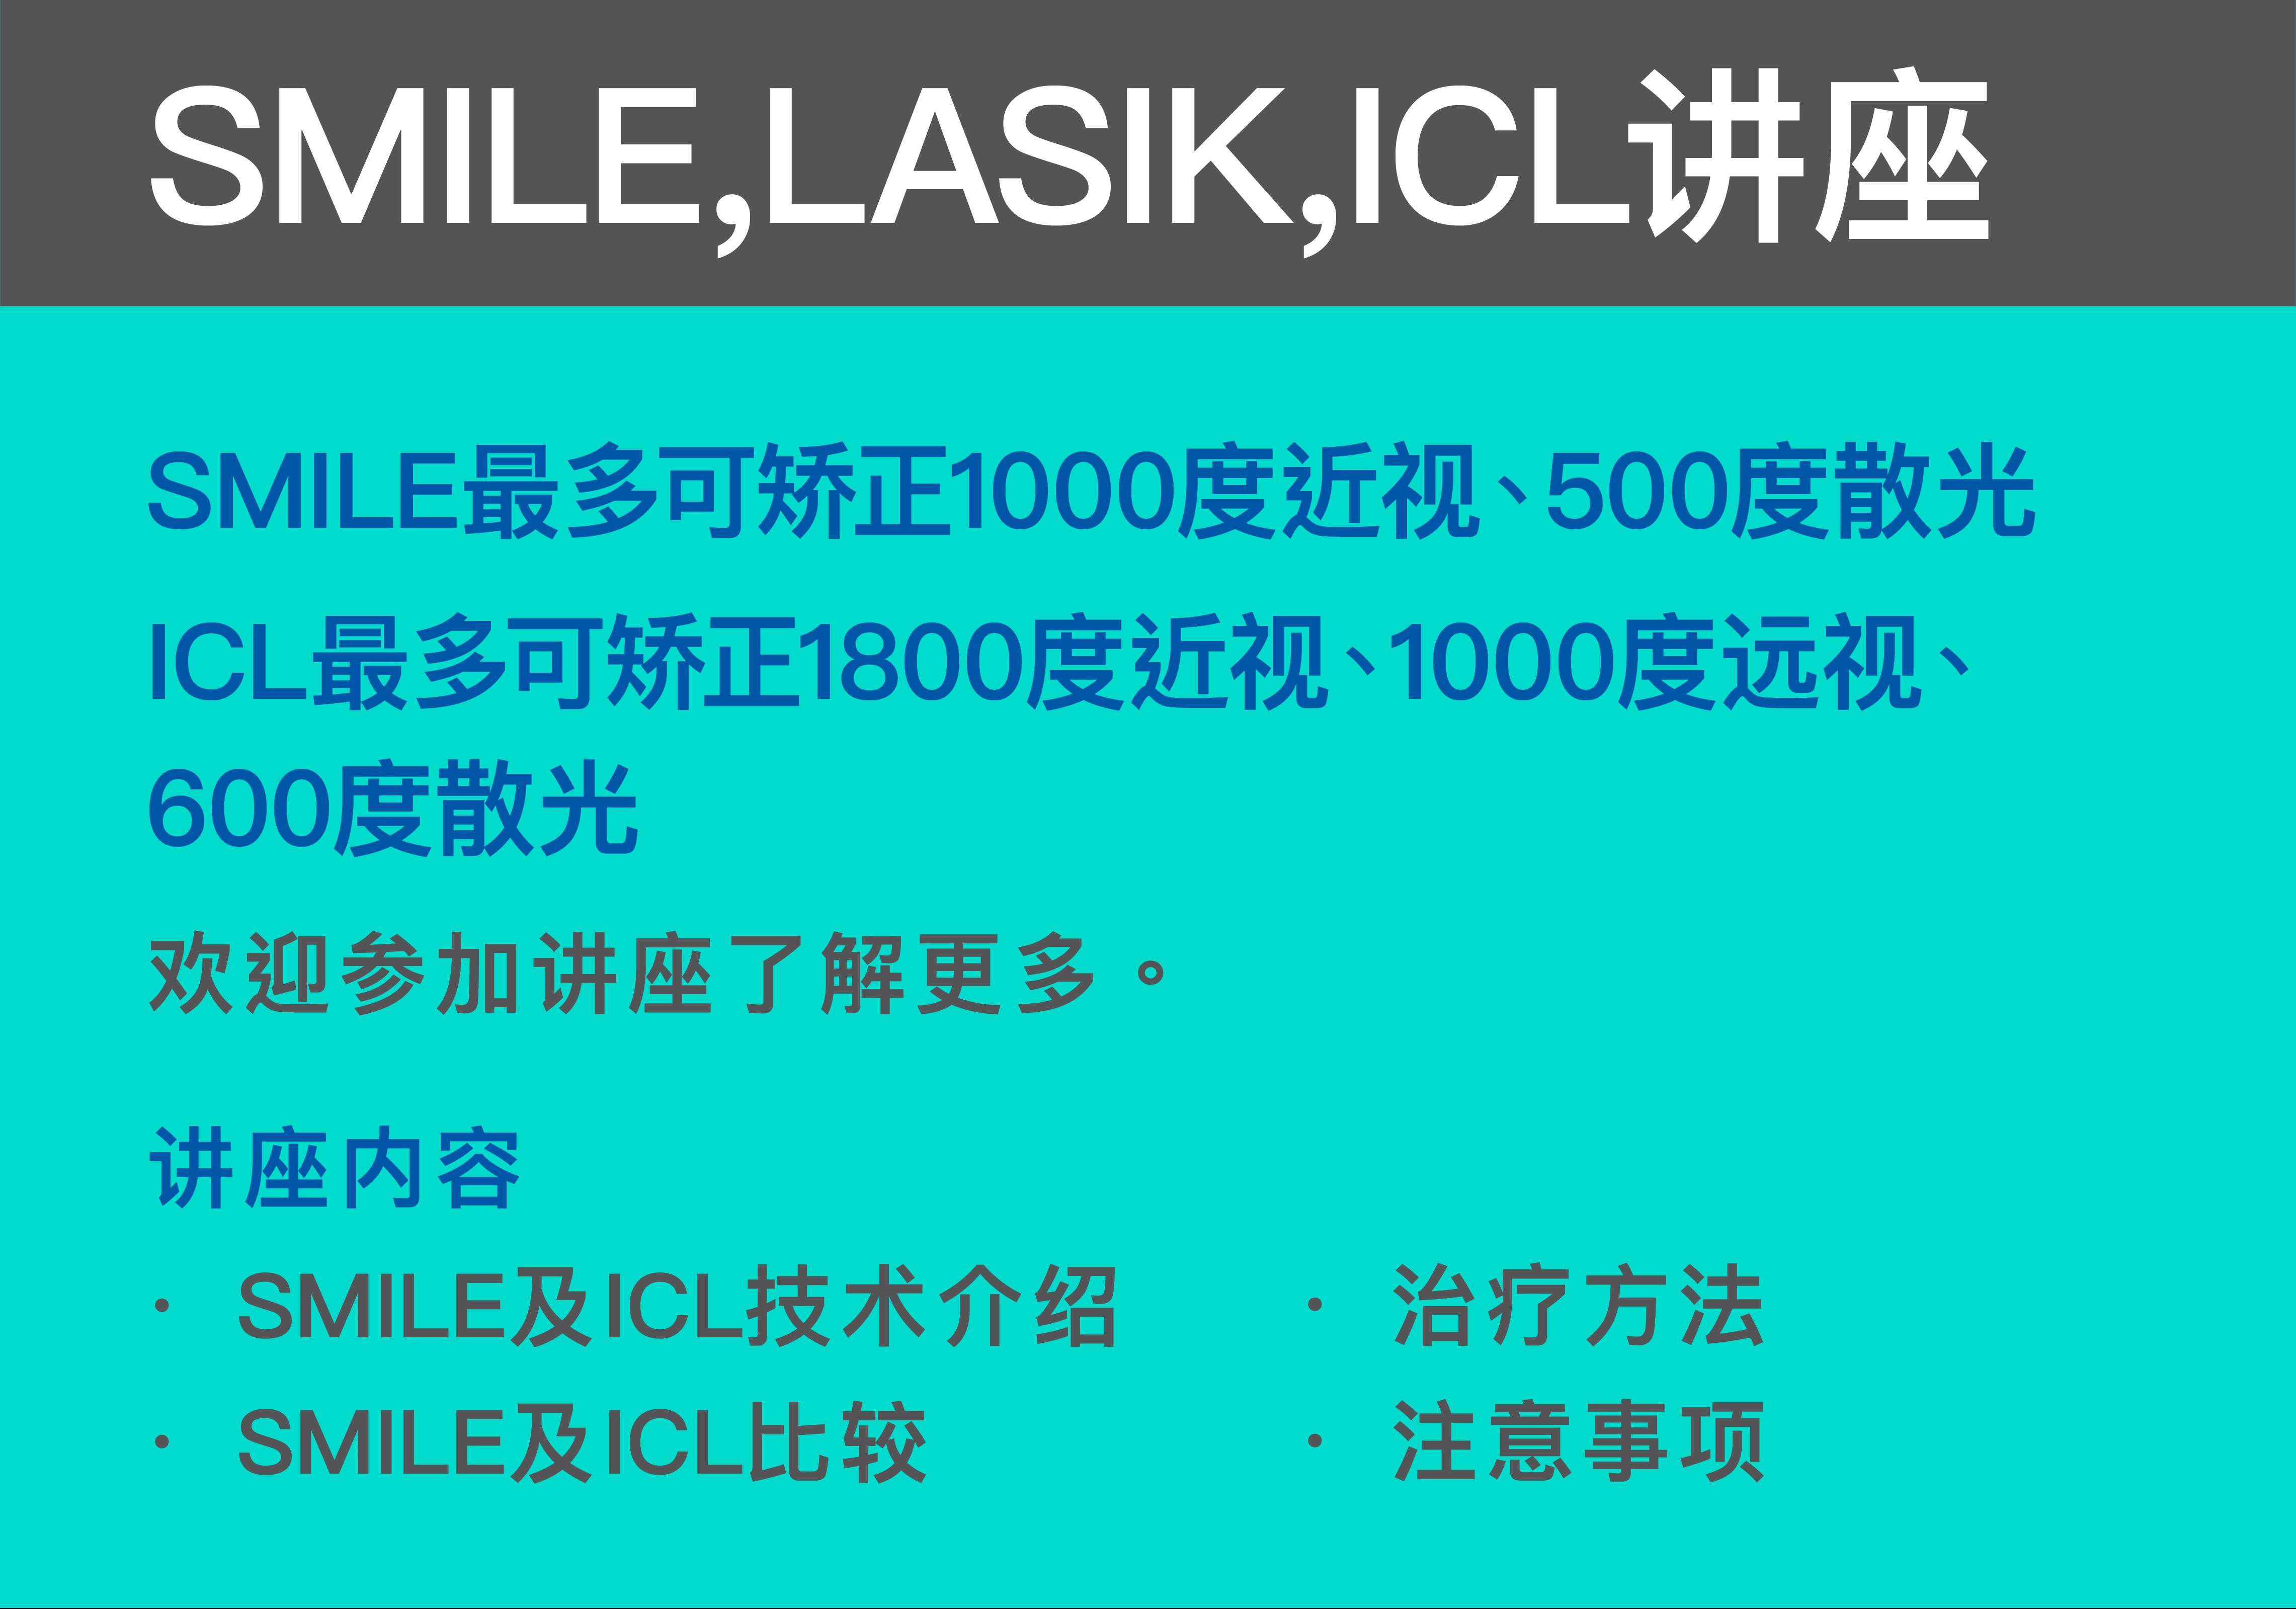 Smile Lasik ICL-02